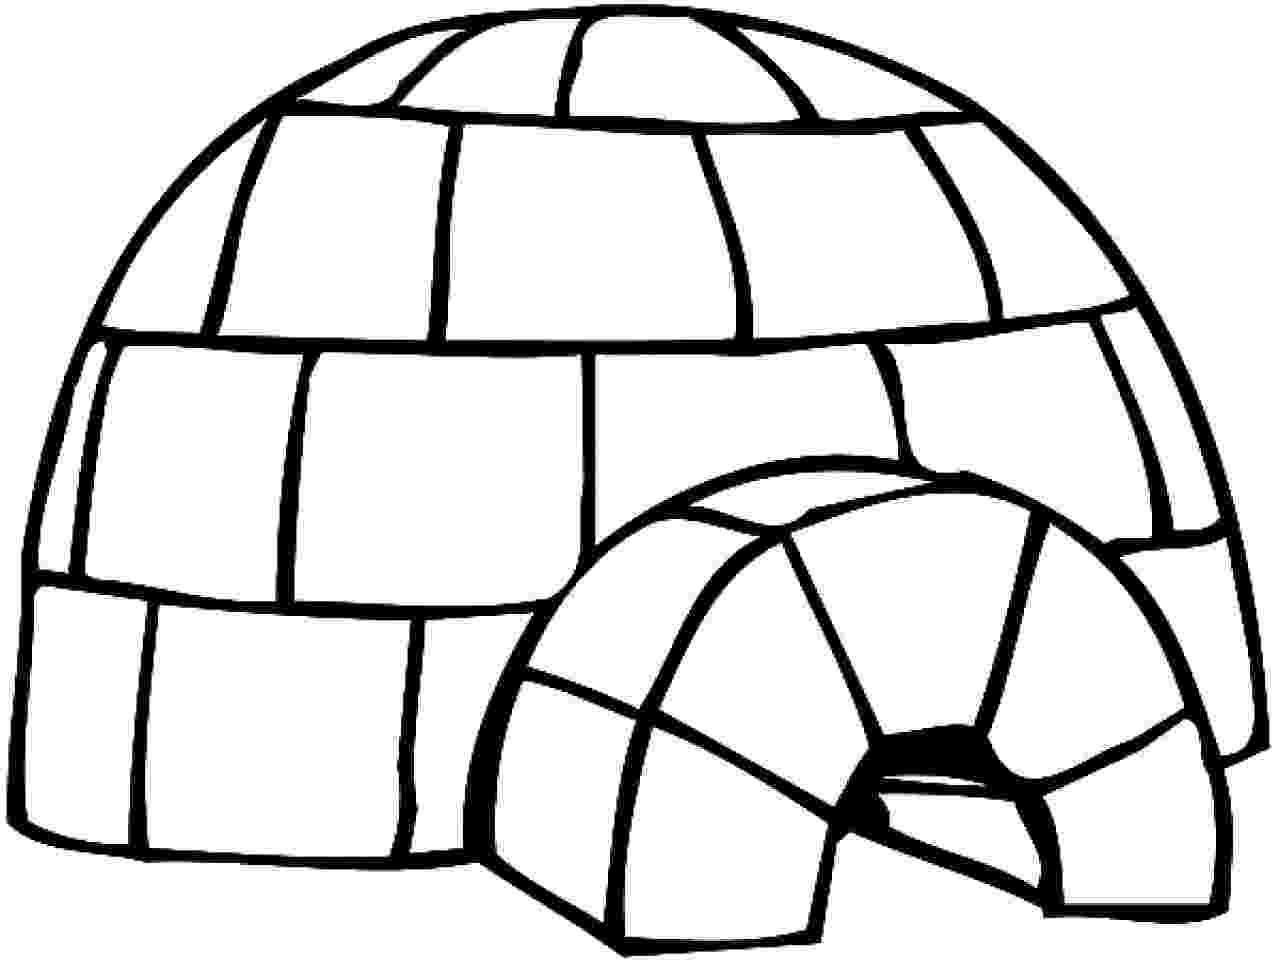 igloo coloring page igloos igloo facts coloring igloo page